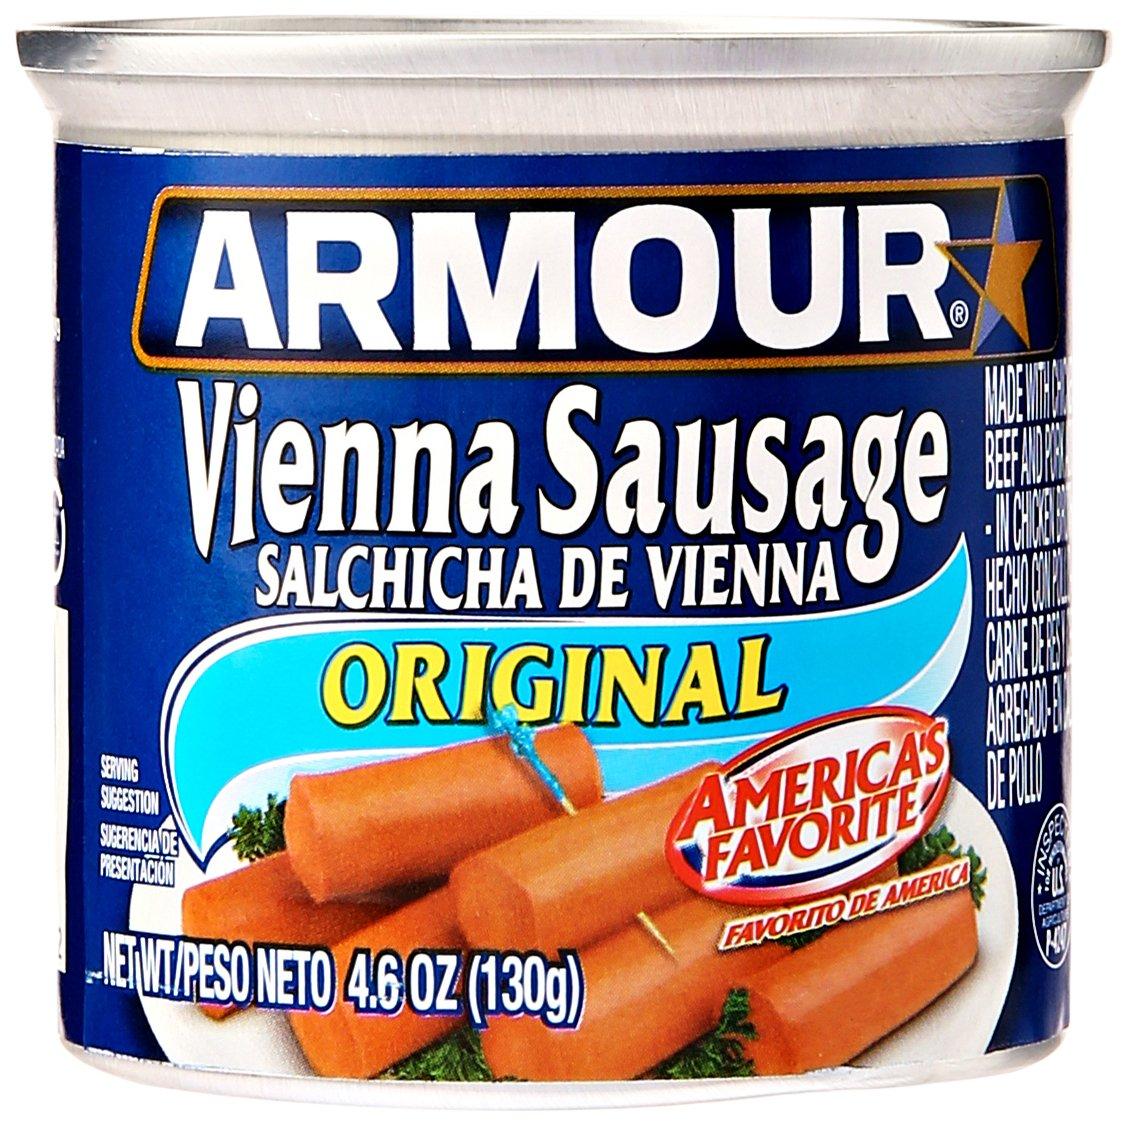 Armour Star Vienna Sausage, Original Flavor, Canned Sausage, 4.6 OZ (Pack of 6)